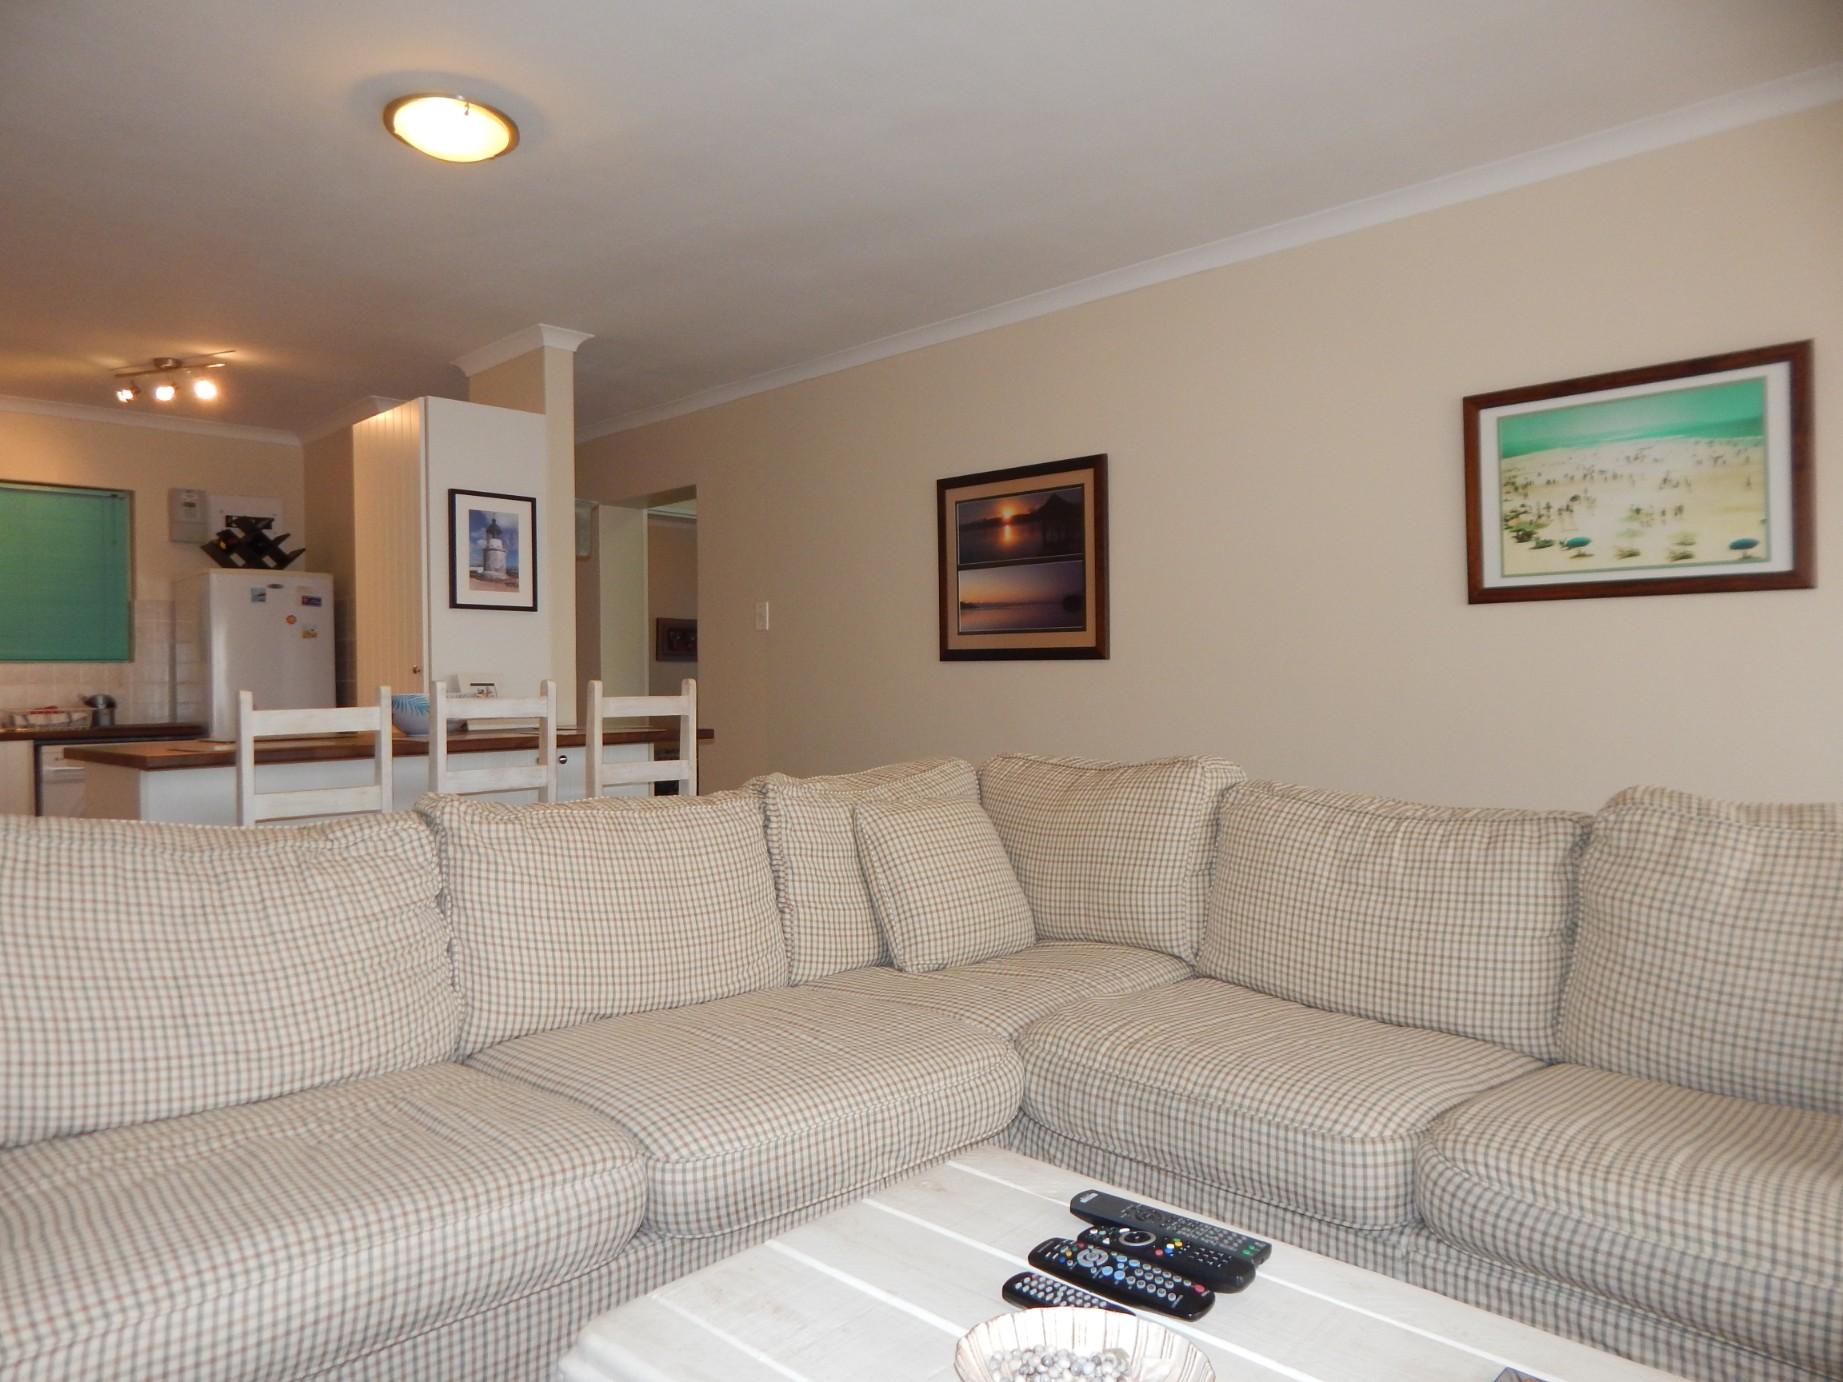 3 Bedroom Apartment for sale in De Bakke ENT0066483 : photo#4